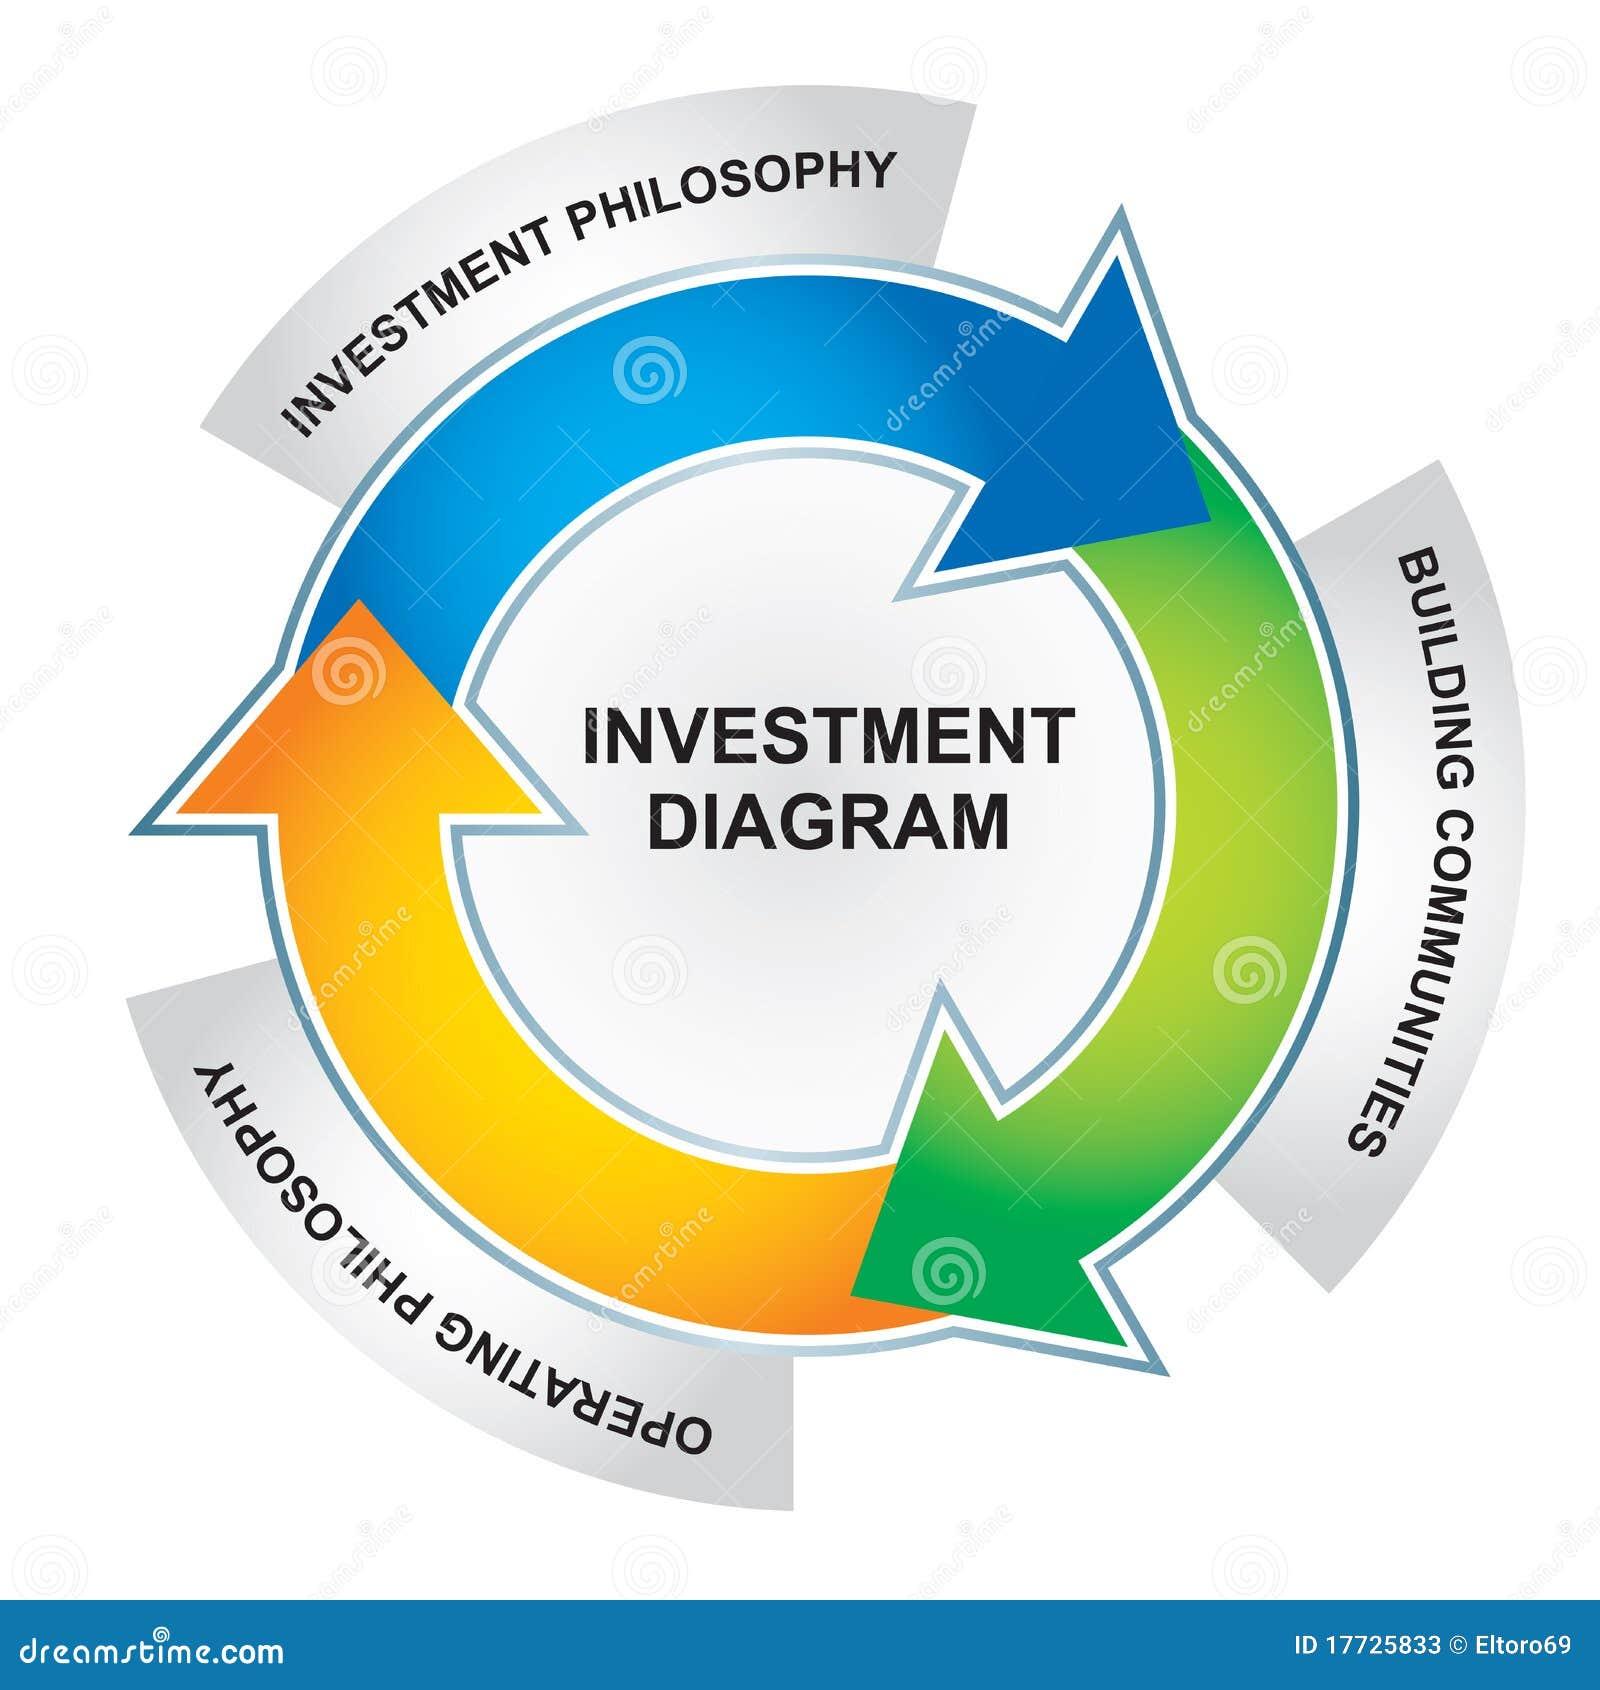 Investment Diagram Stock Vector. Illustration Of Economic